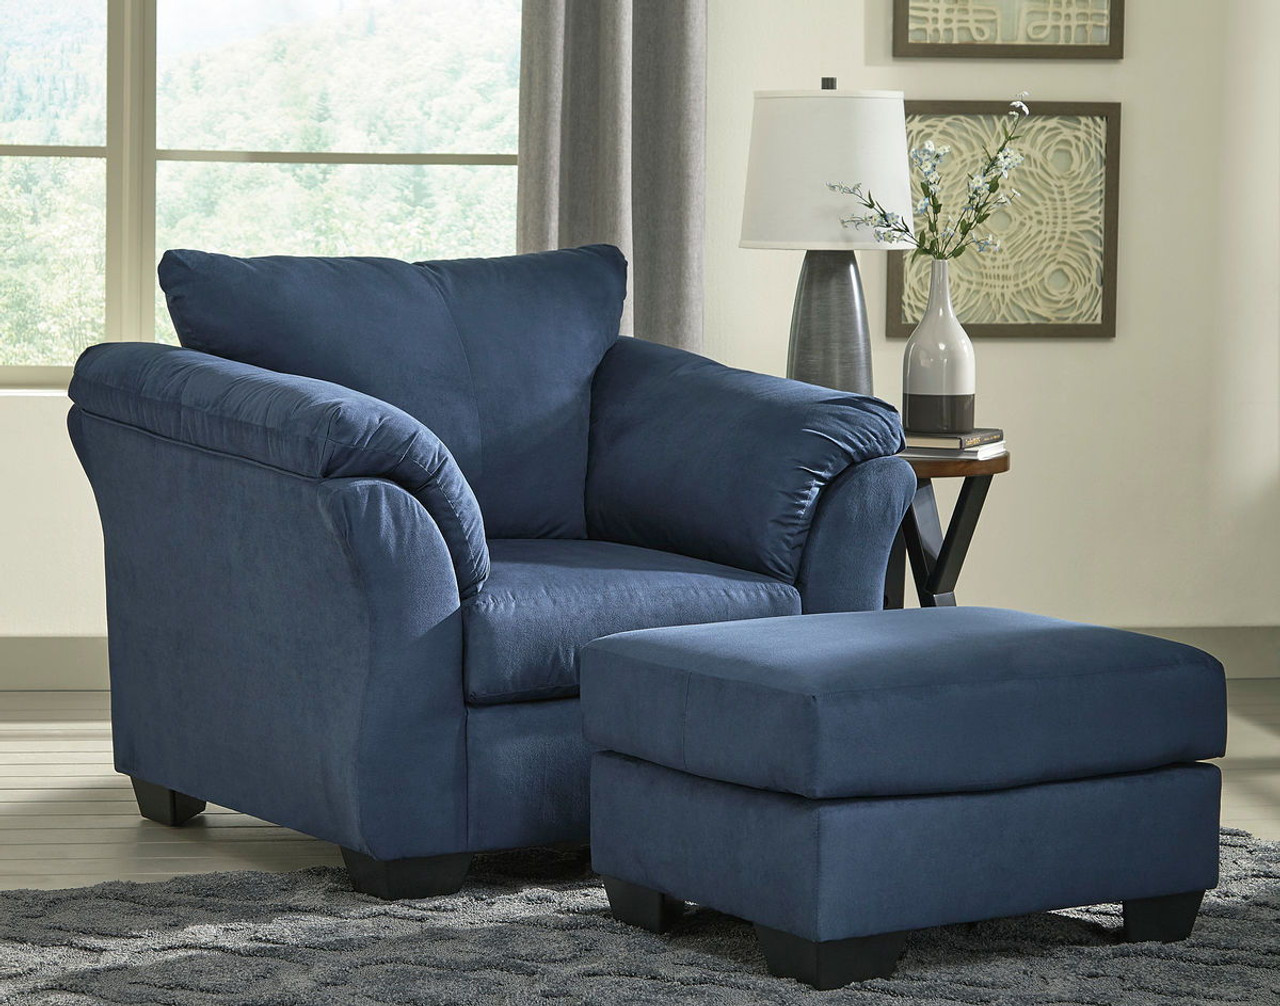 Pleasant Darcy Blue Chair With Ottoman Ibusinesslaw Wood Chair Design Ideas Ibusinesslaworg